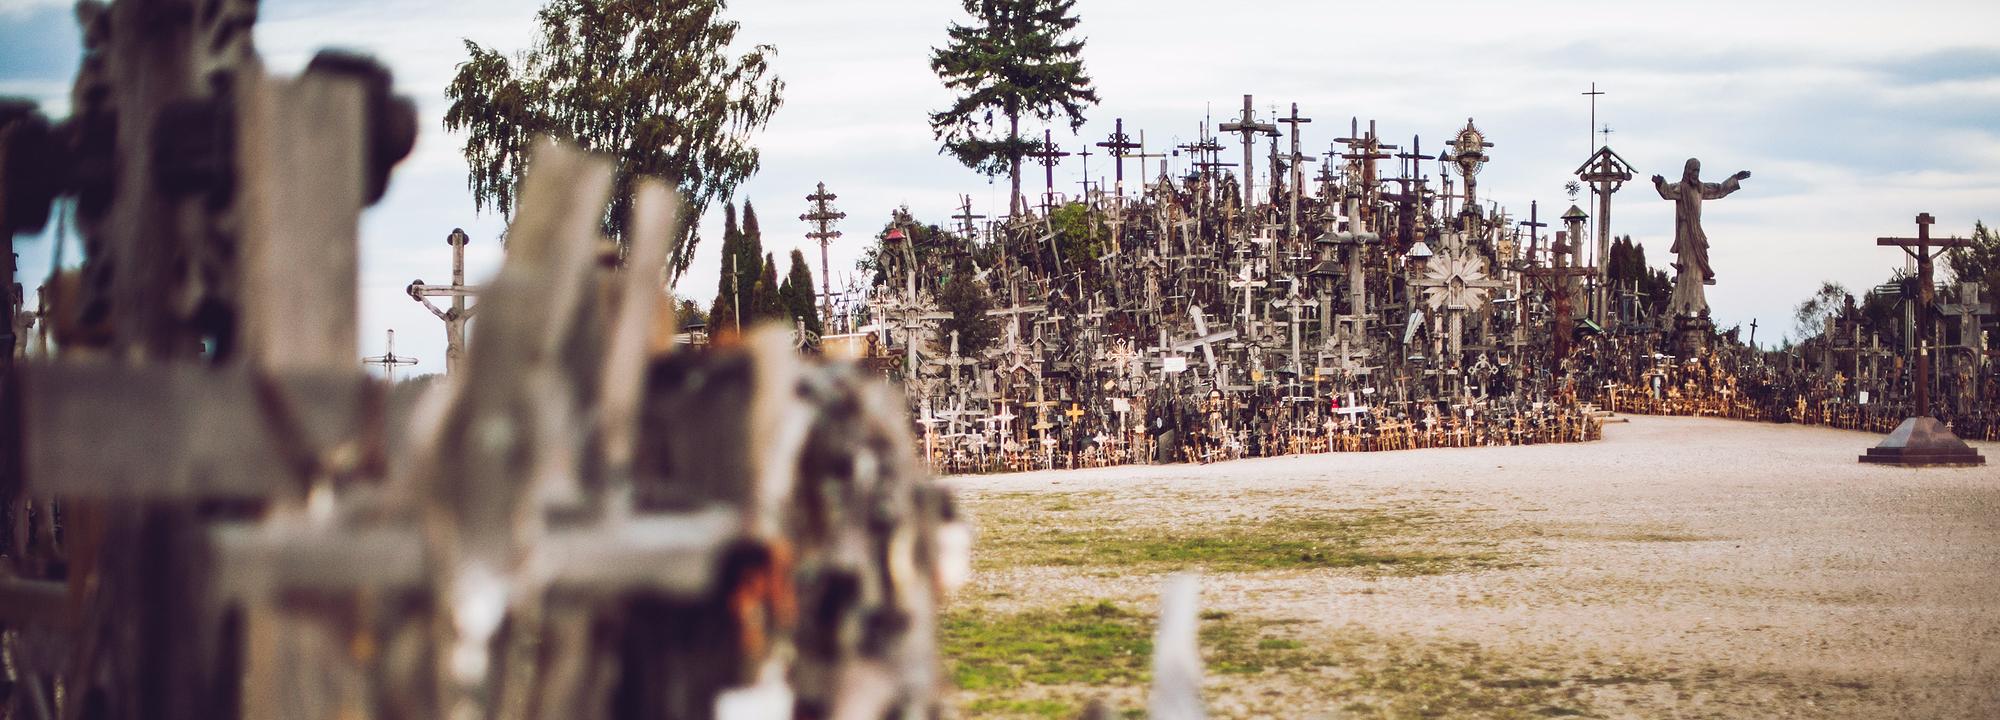 Hřibtov osázený křížy